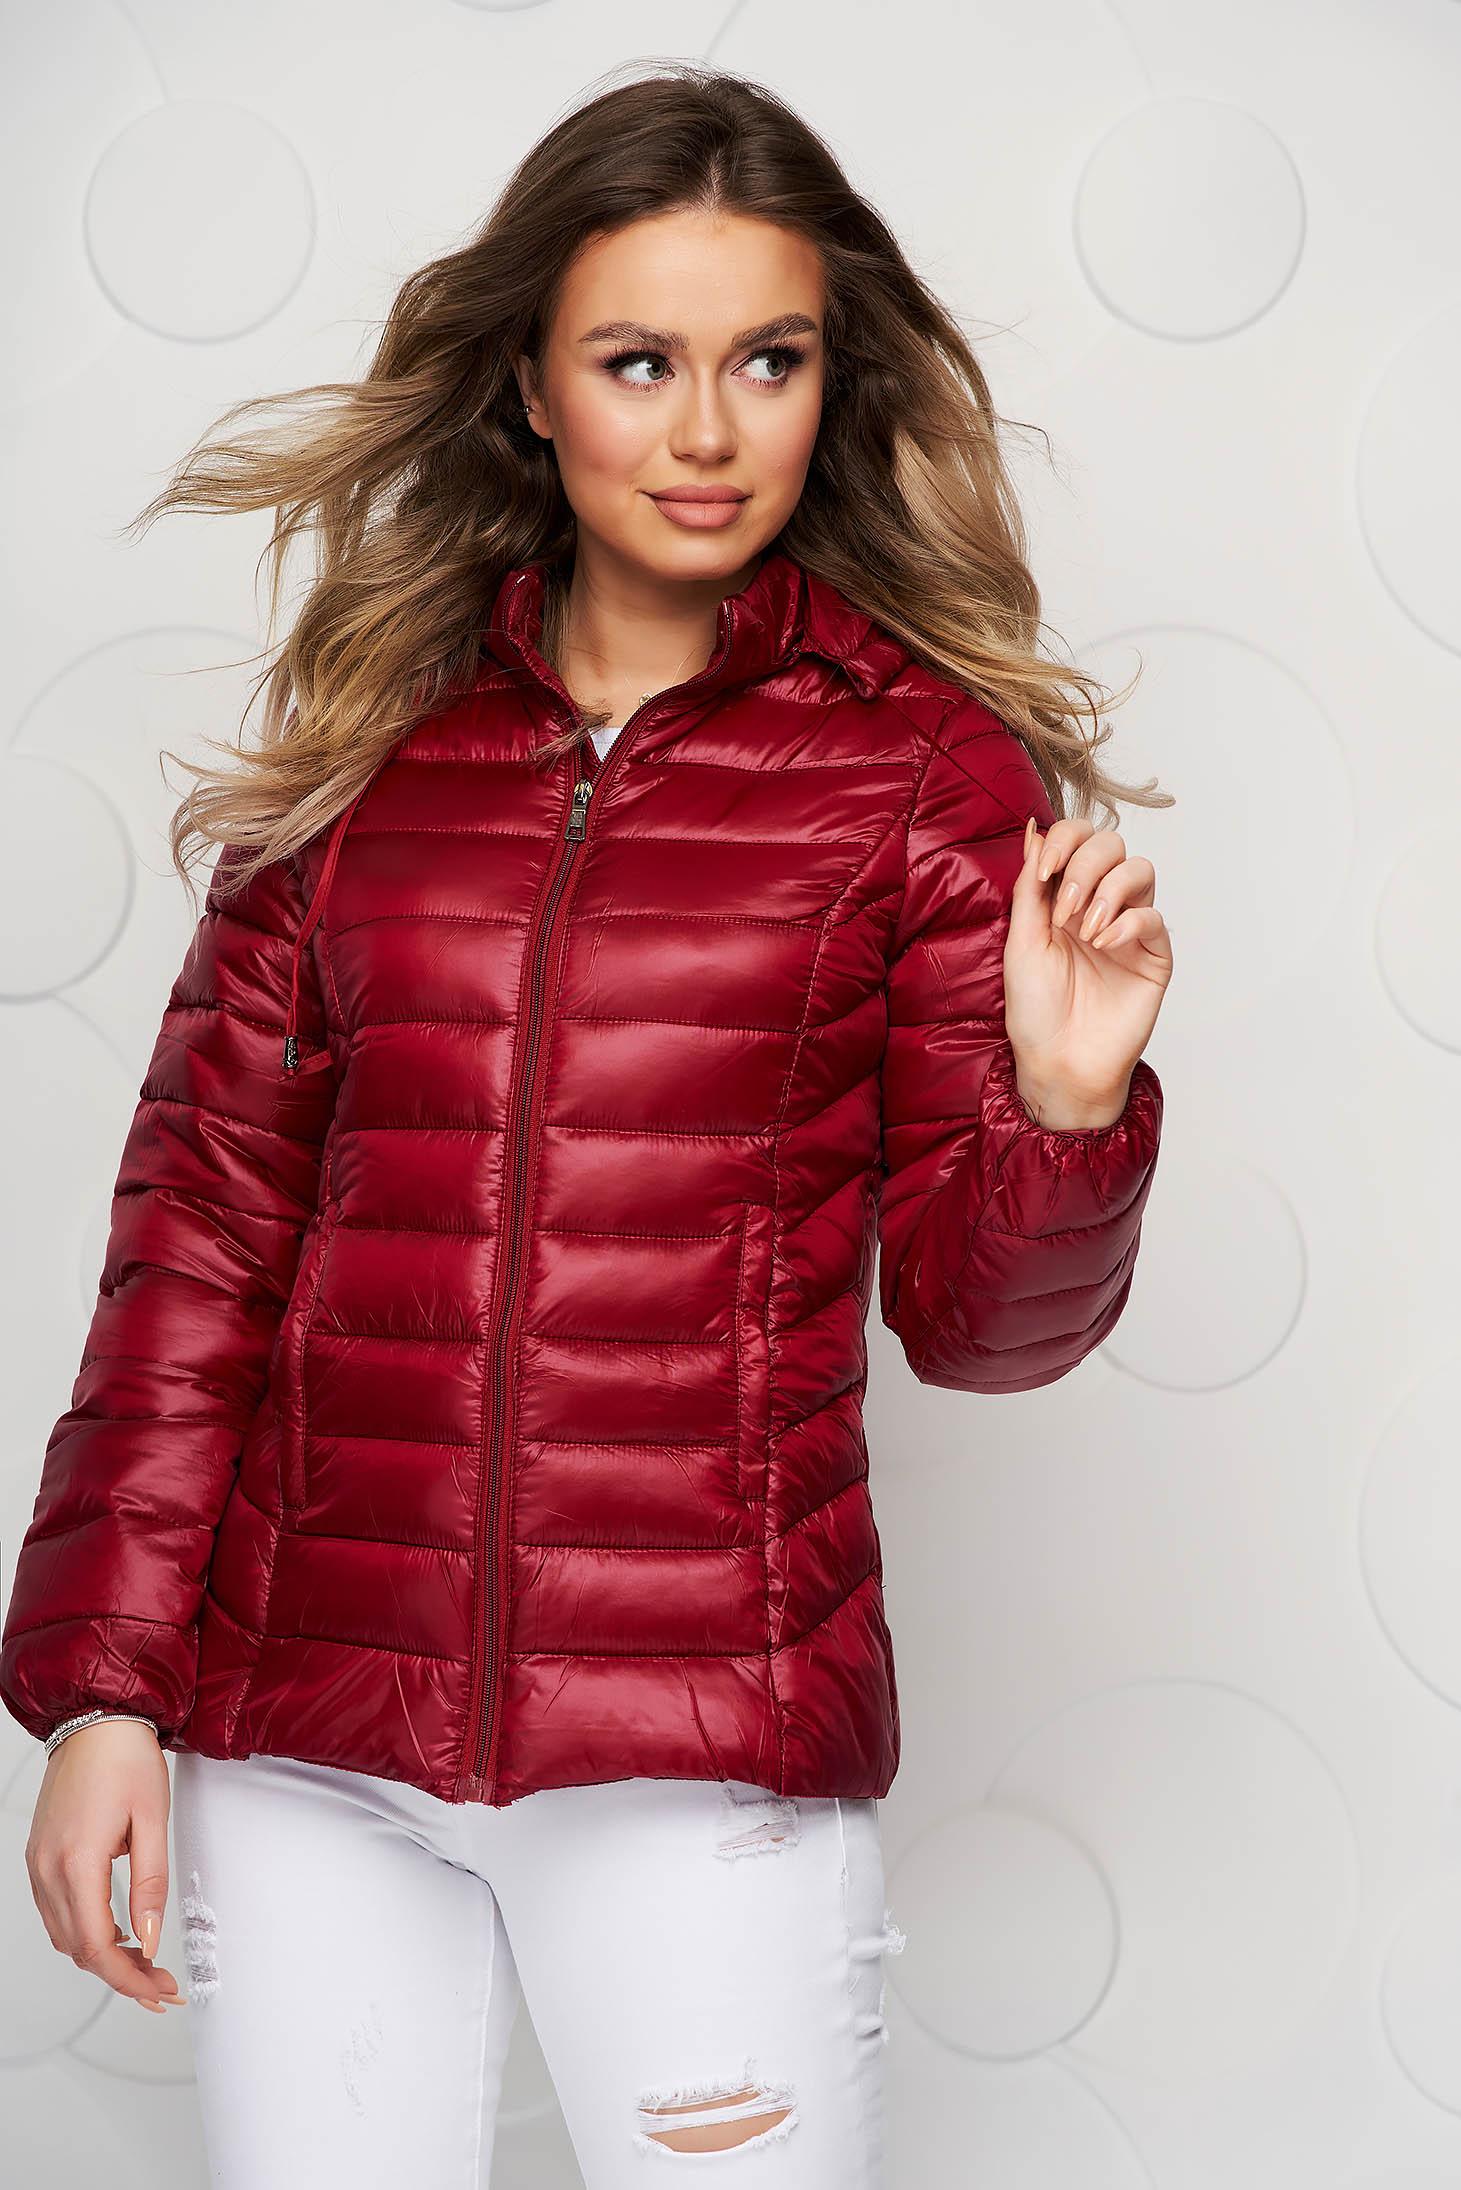 Burgundy jacket from slicker thin fabric